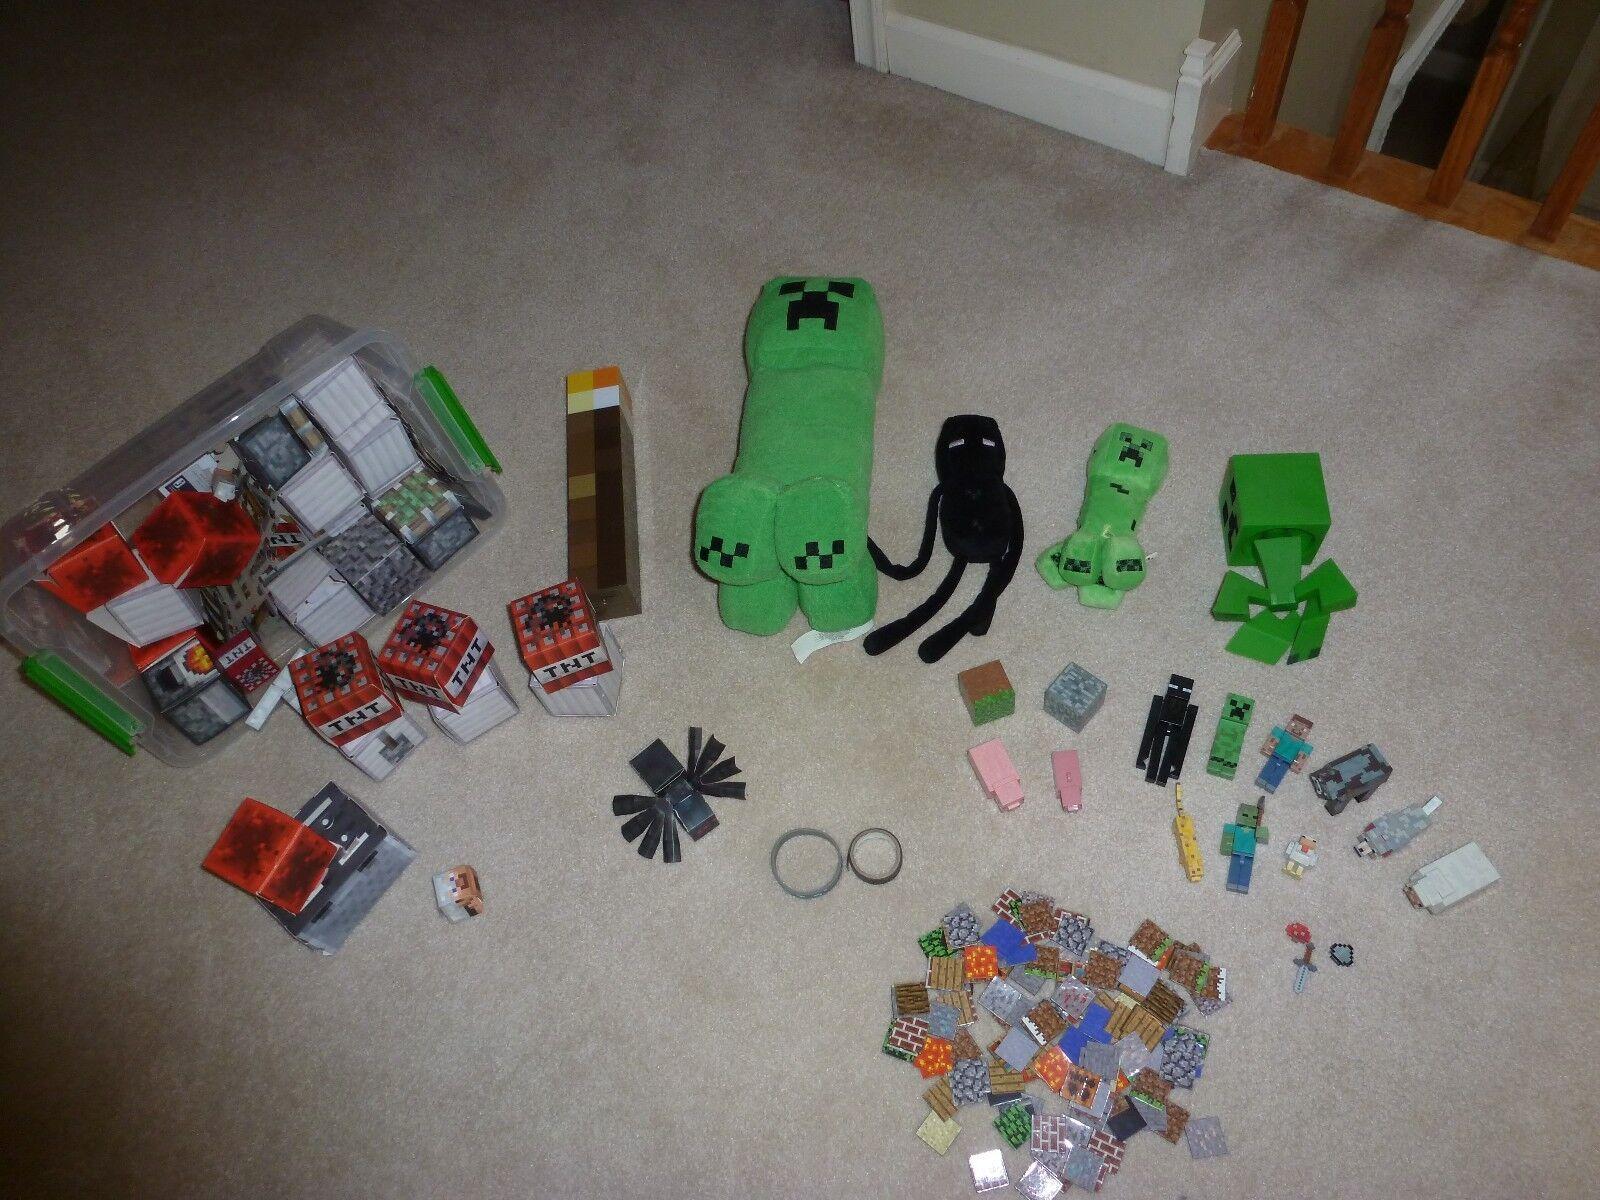 Minecraft Creeper Enderman Torch Accessories Accessories Accessories Figurines 384f6f